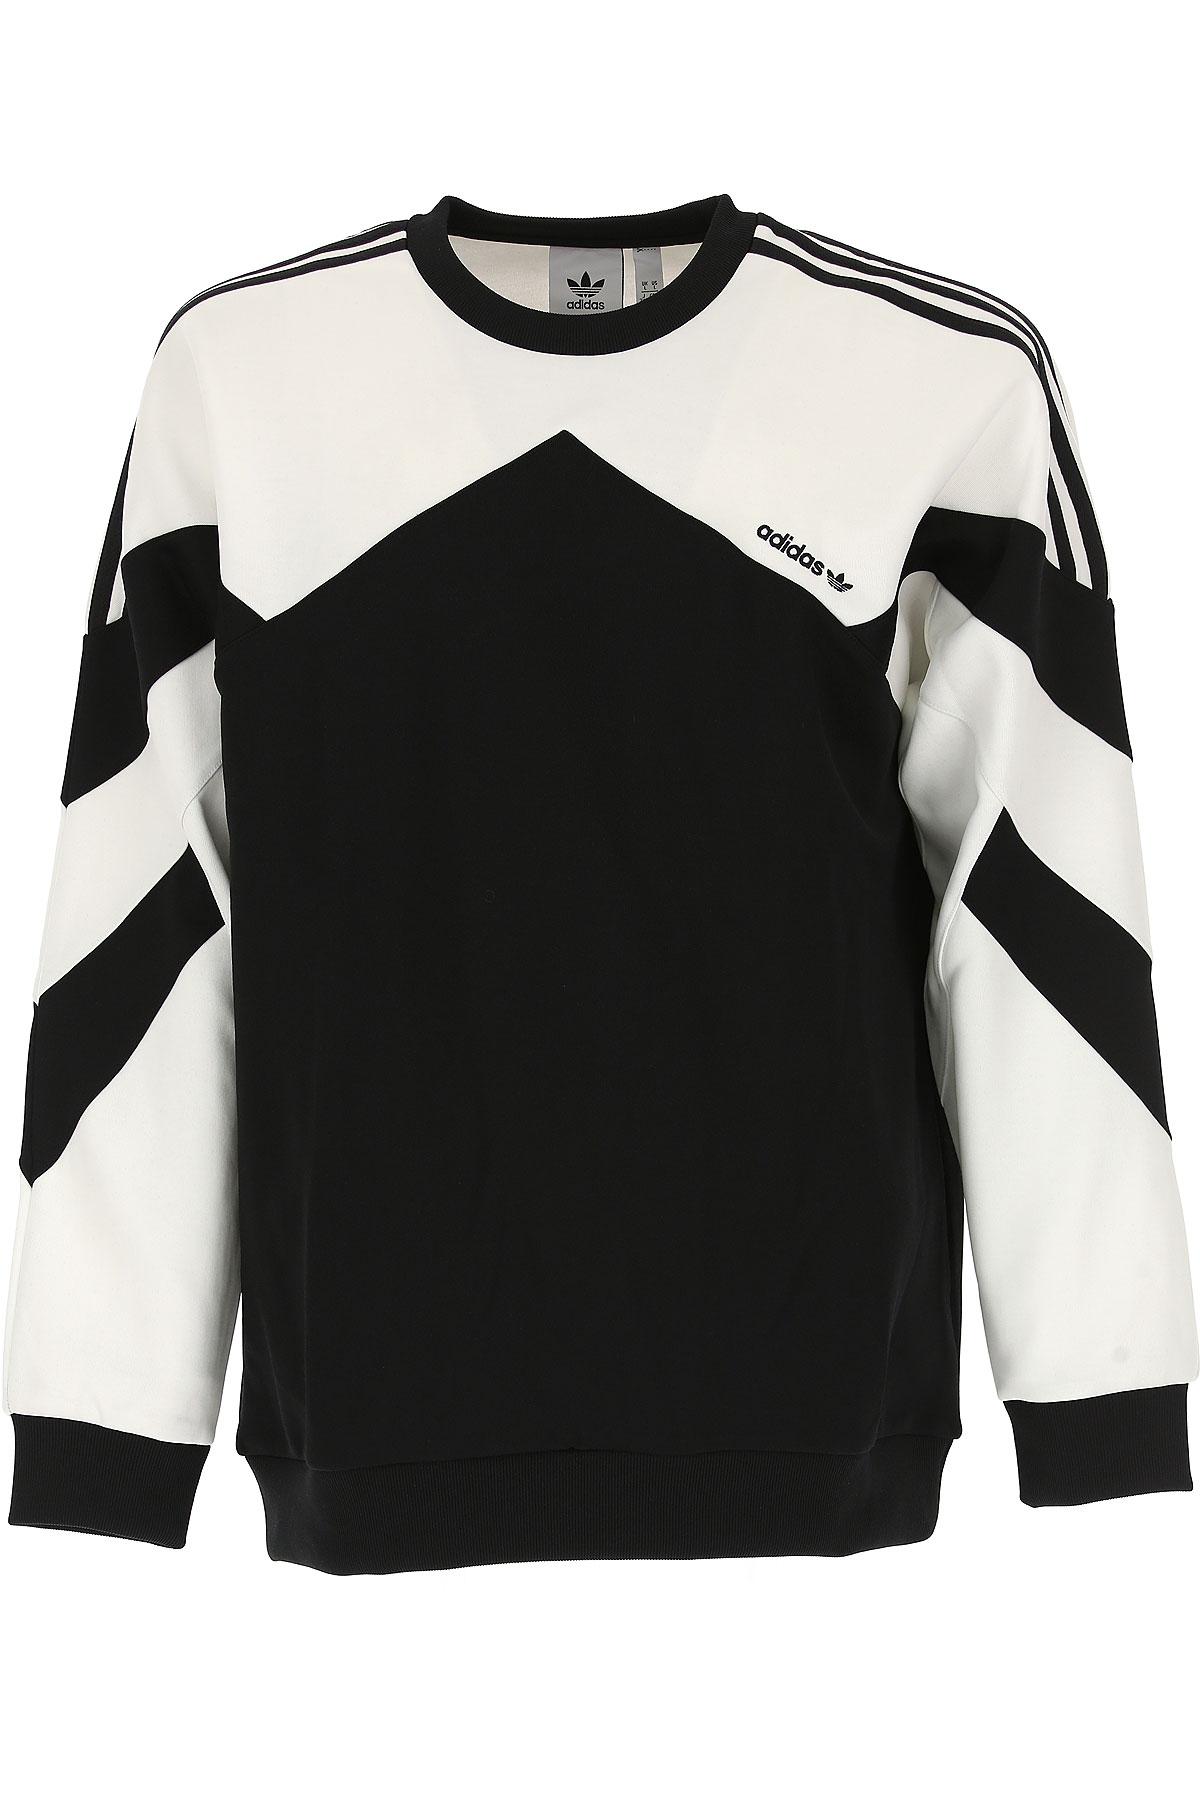 Adidas Sweatshirt for Men, Black, polyester, 2017, L XL USA-467644